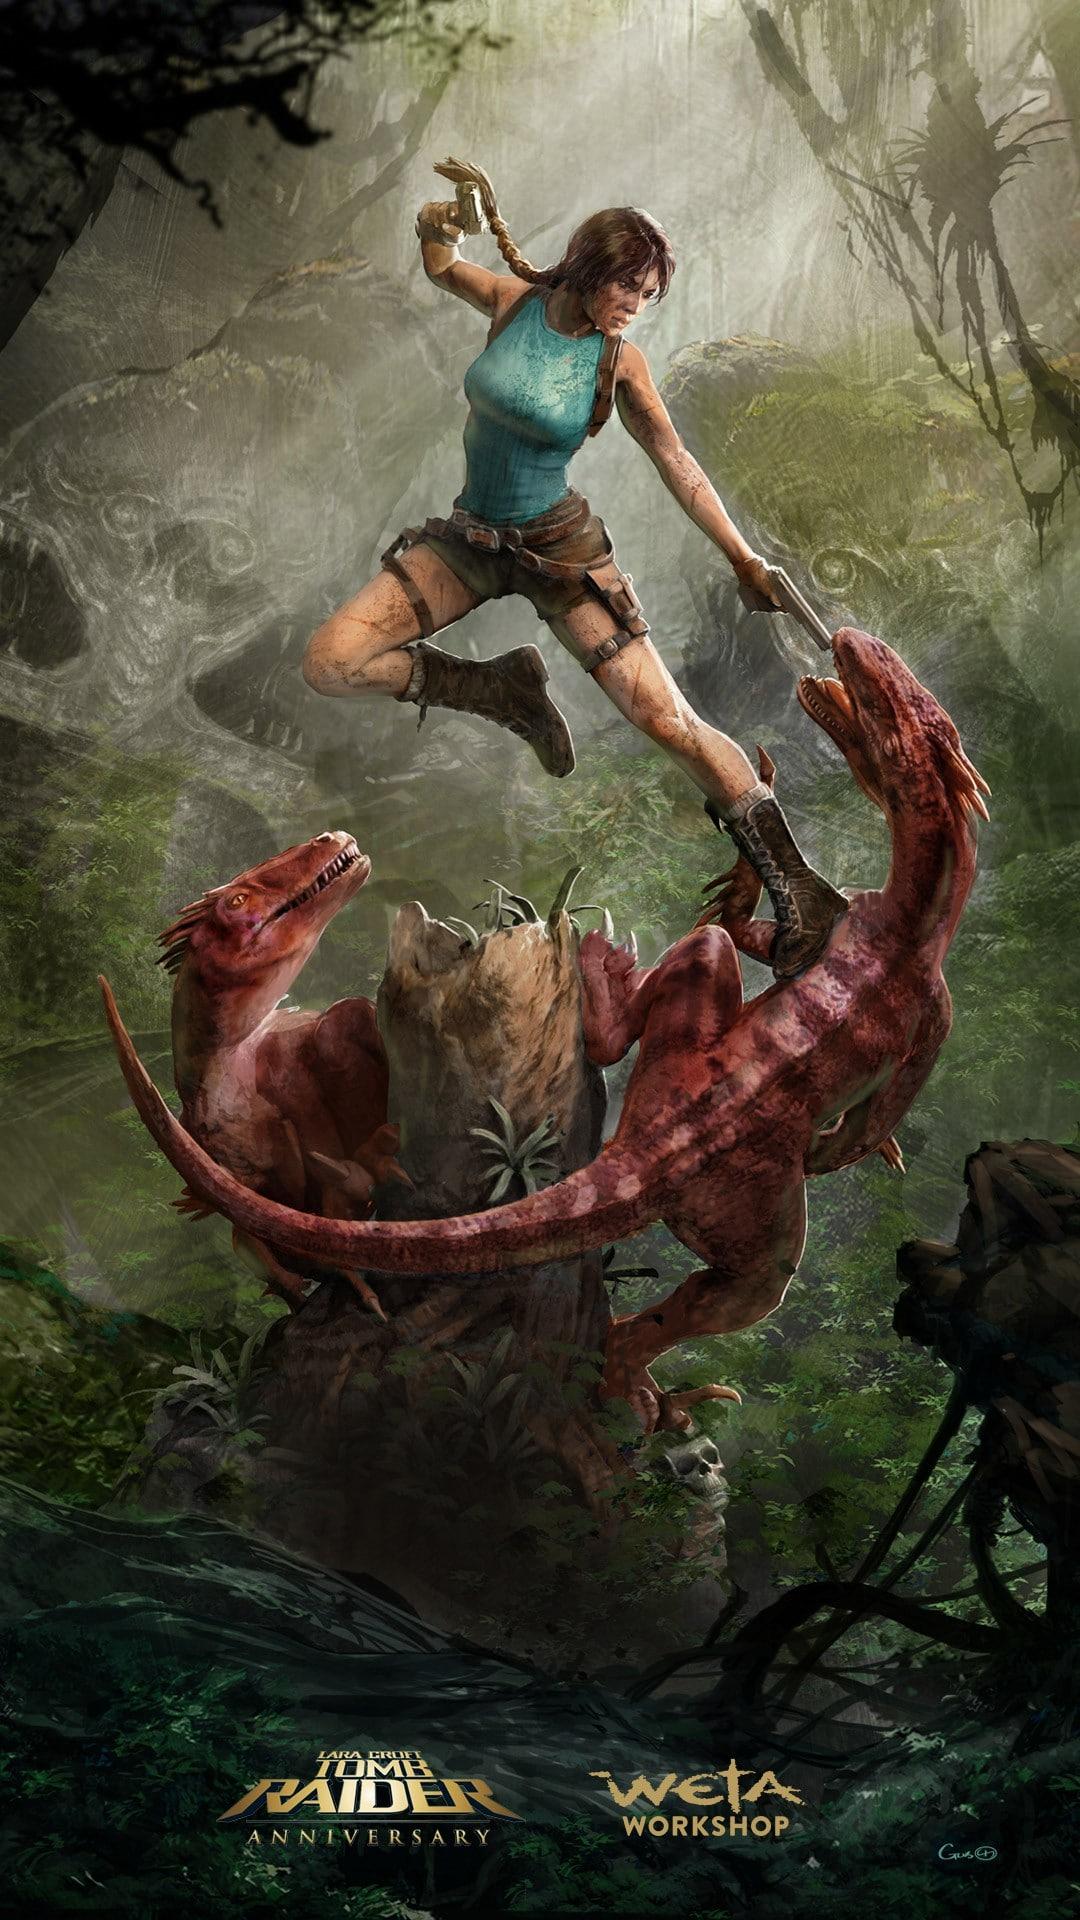 Concept Art Tomb Raider 25th Anniversary par Weta